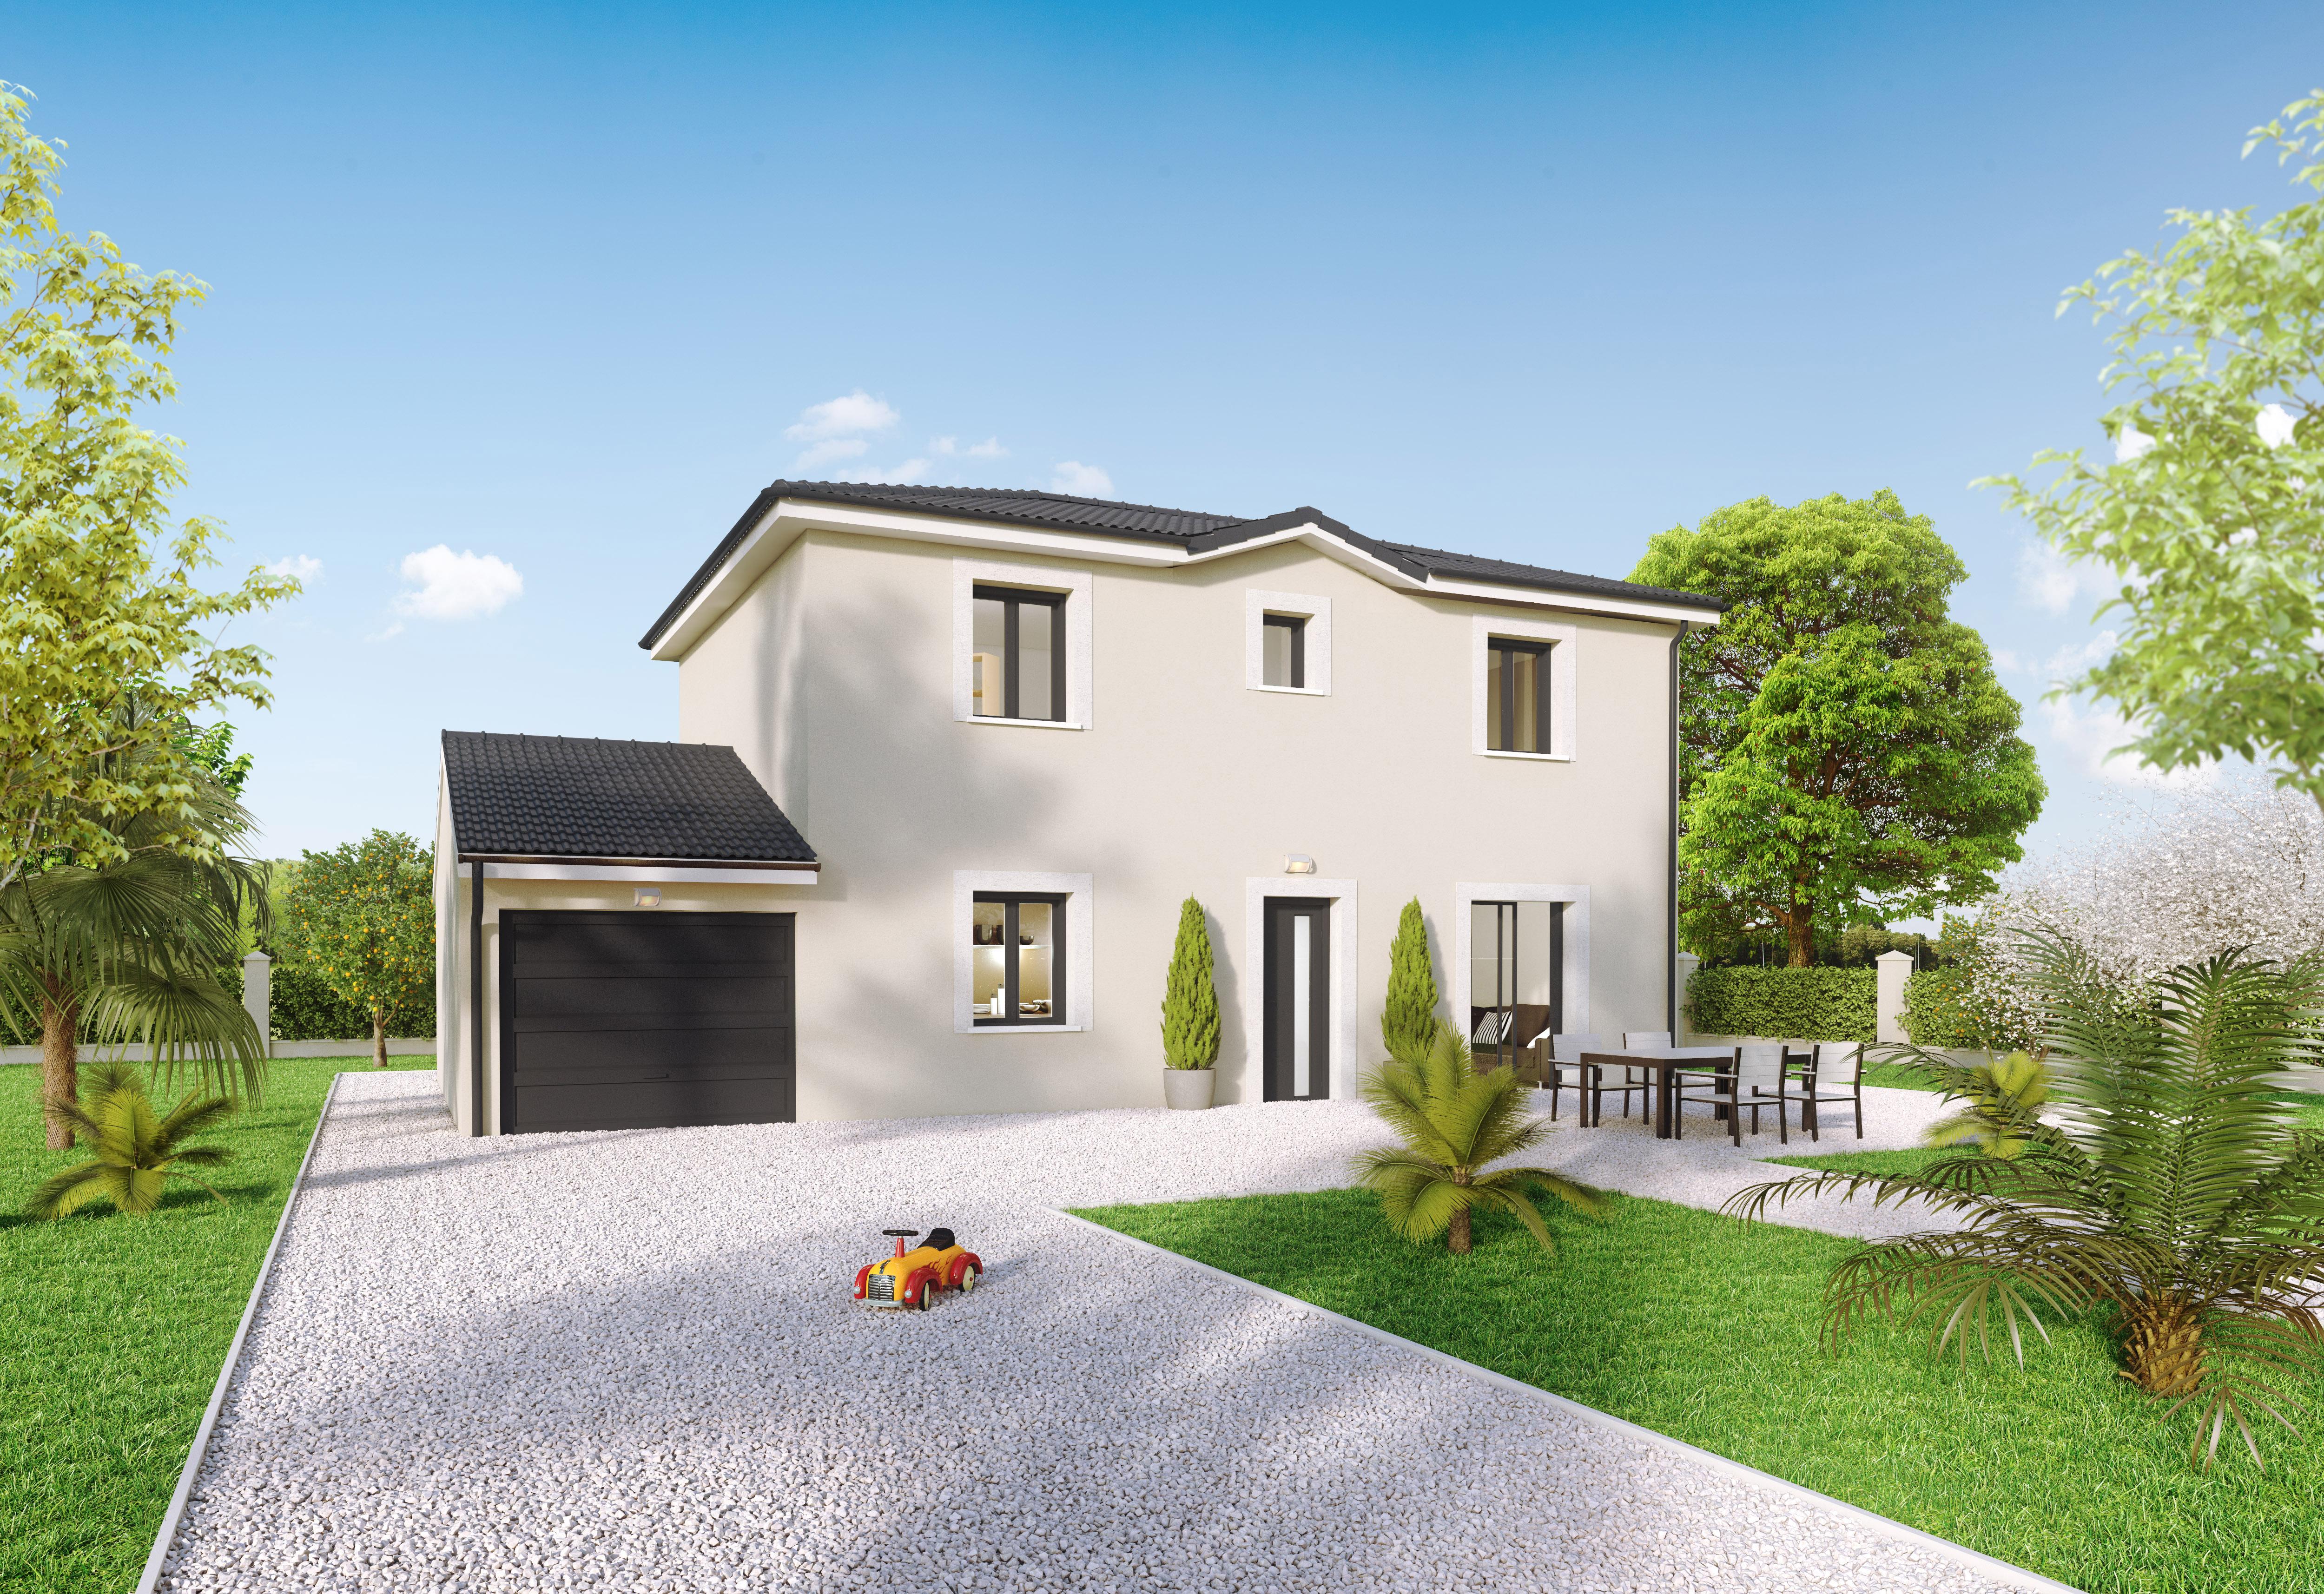 Crea concept constructeur immobilier bourgoin jallieu for Constructeur maison bourgoin